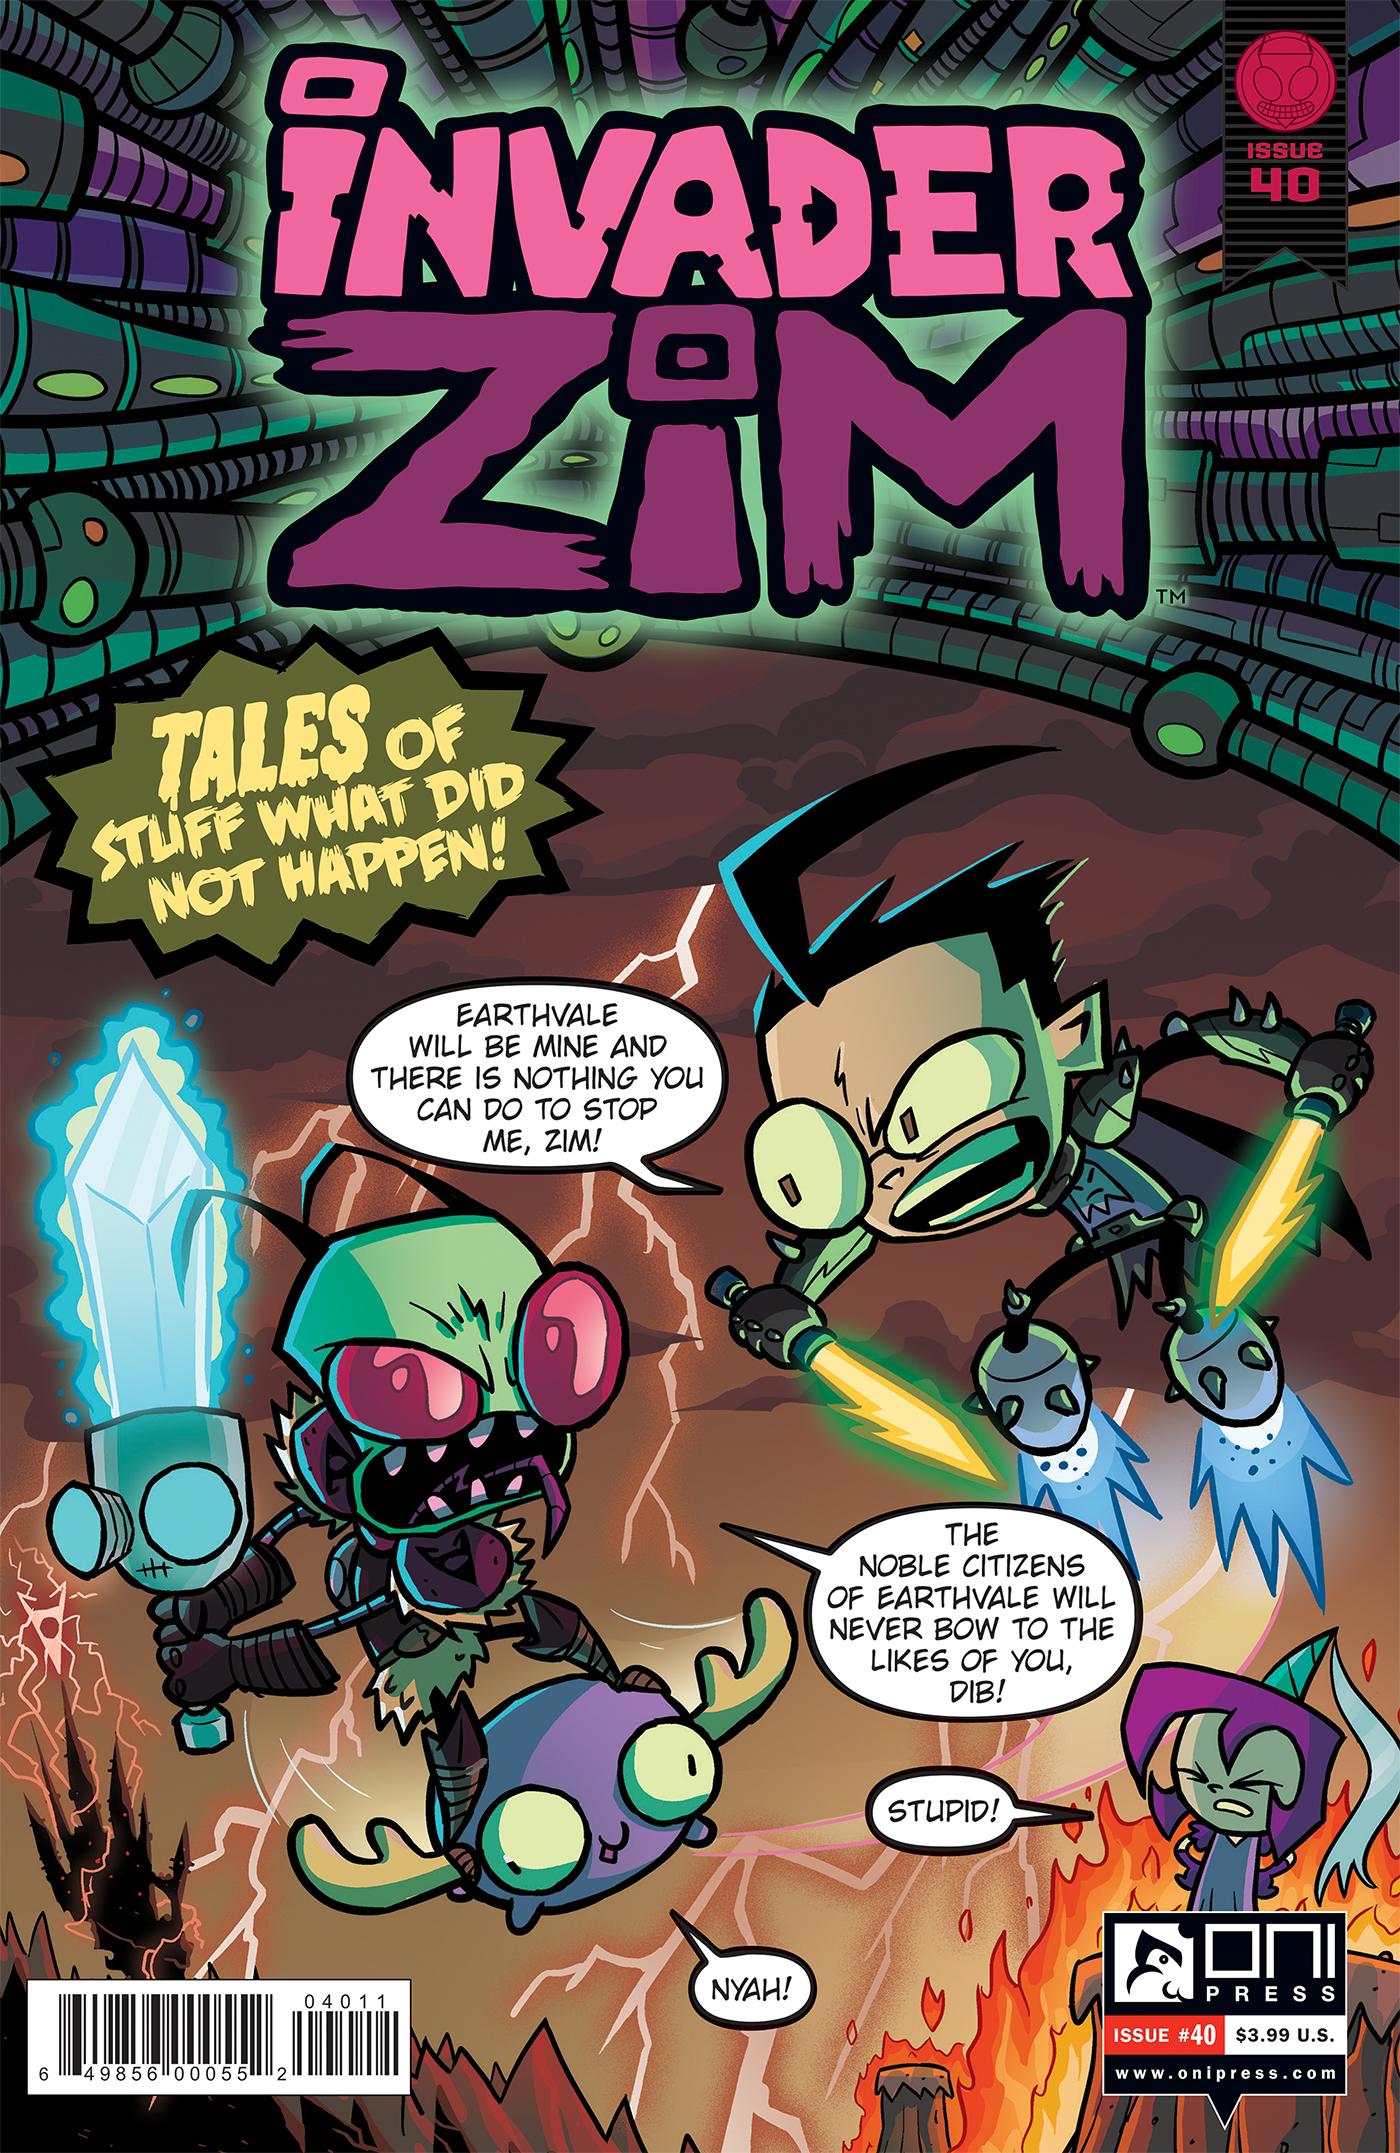 INVADERZIM #40 - COVER A FNL WEB.jpg